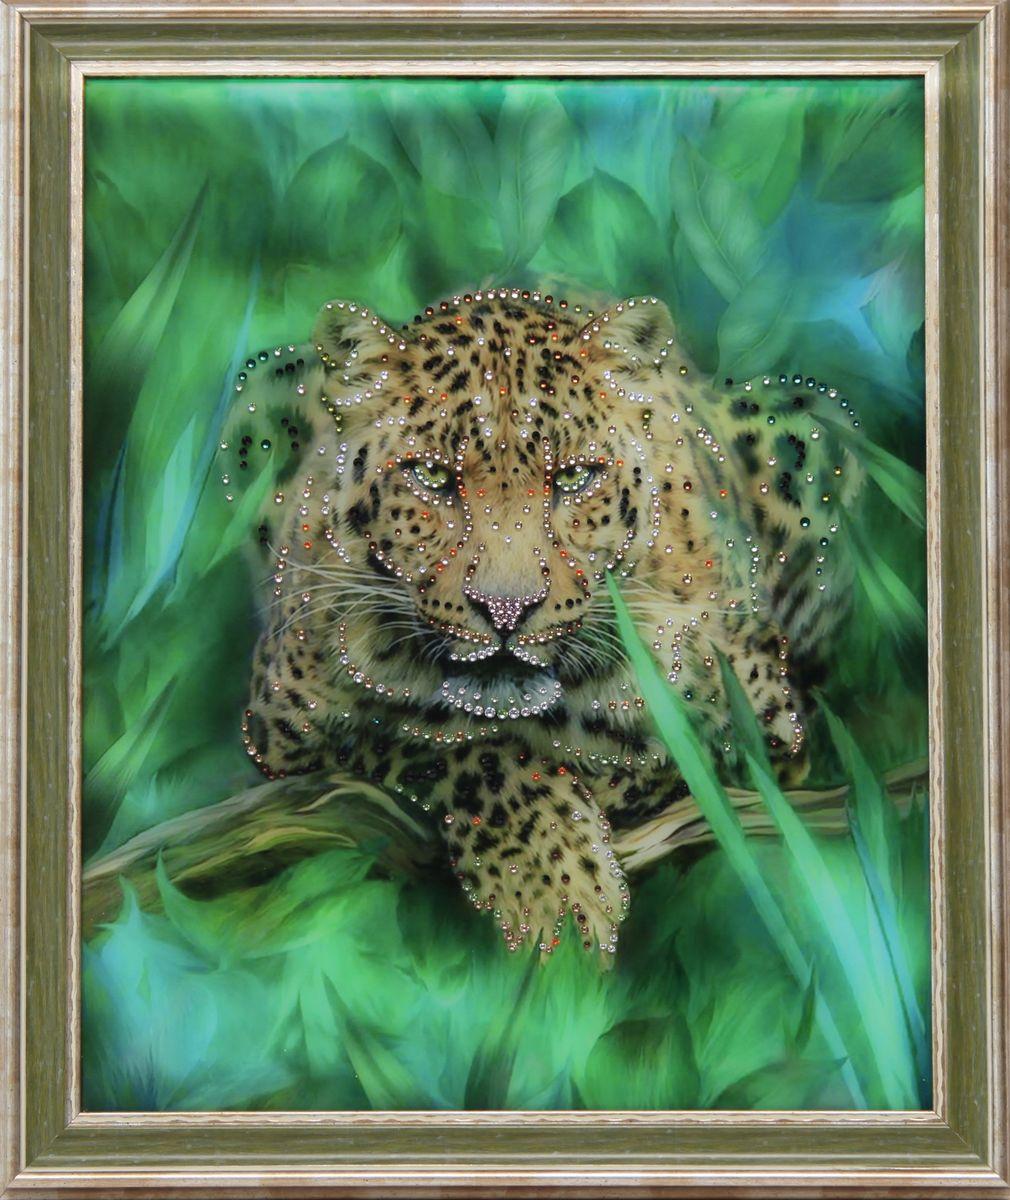 1622 Картина Сваровски Гепард1622стекло, хрусталь, алюминий. 56,7х46,7